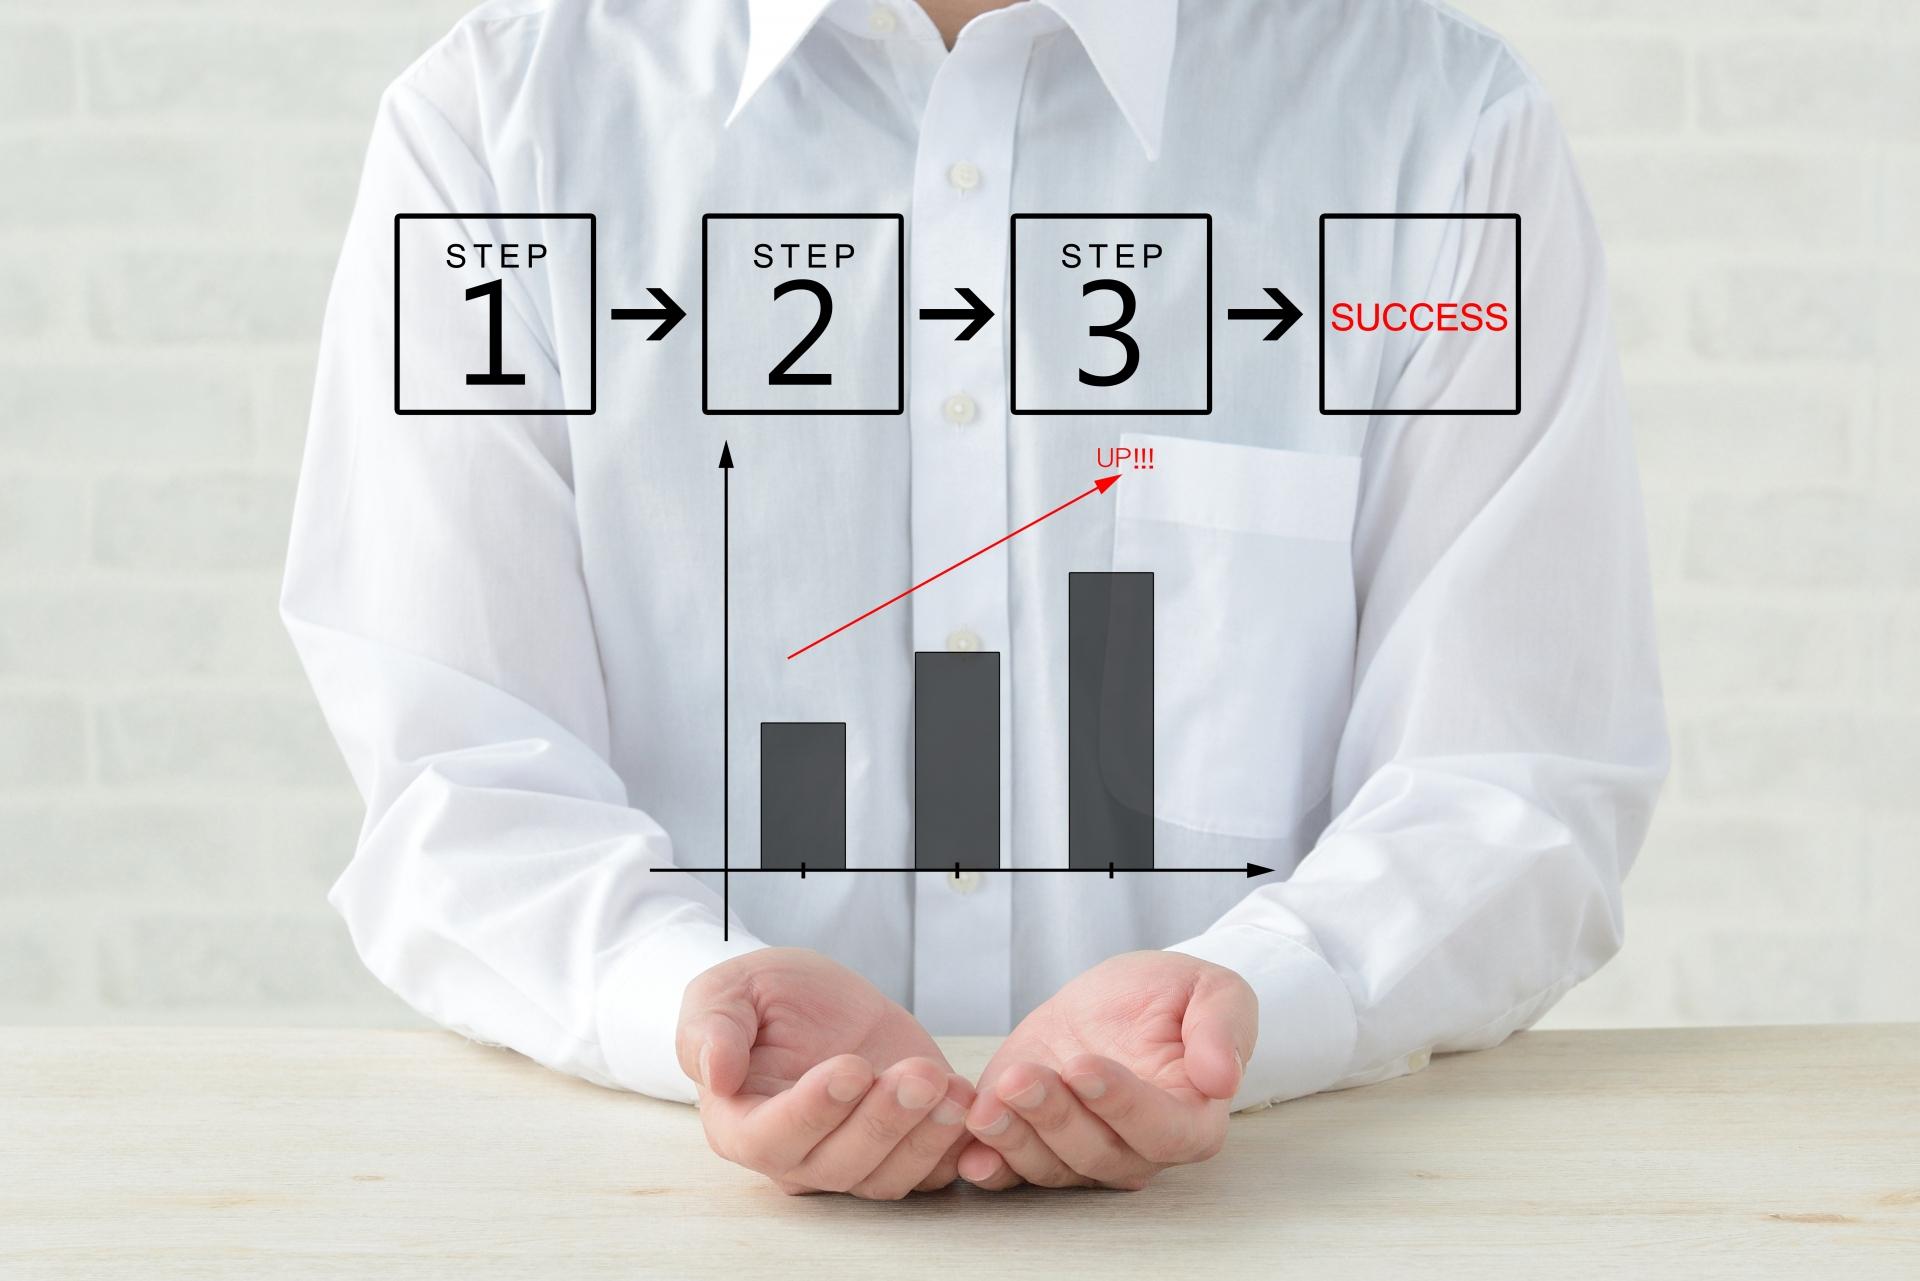 3S活動=整理・整頓・清掃が優秀な人材を育成するのに有効なのはなぜ?